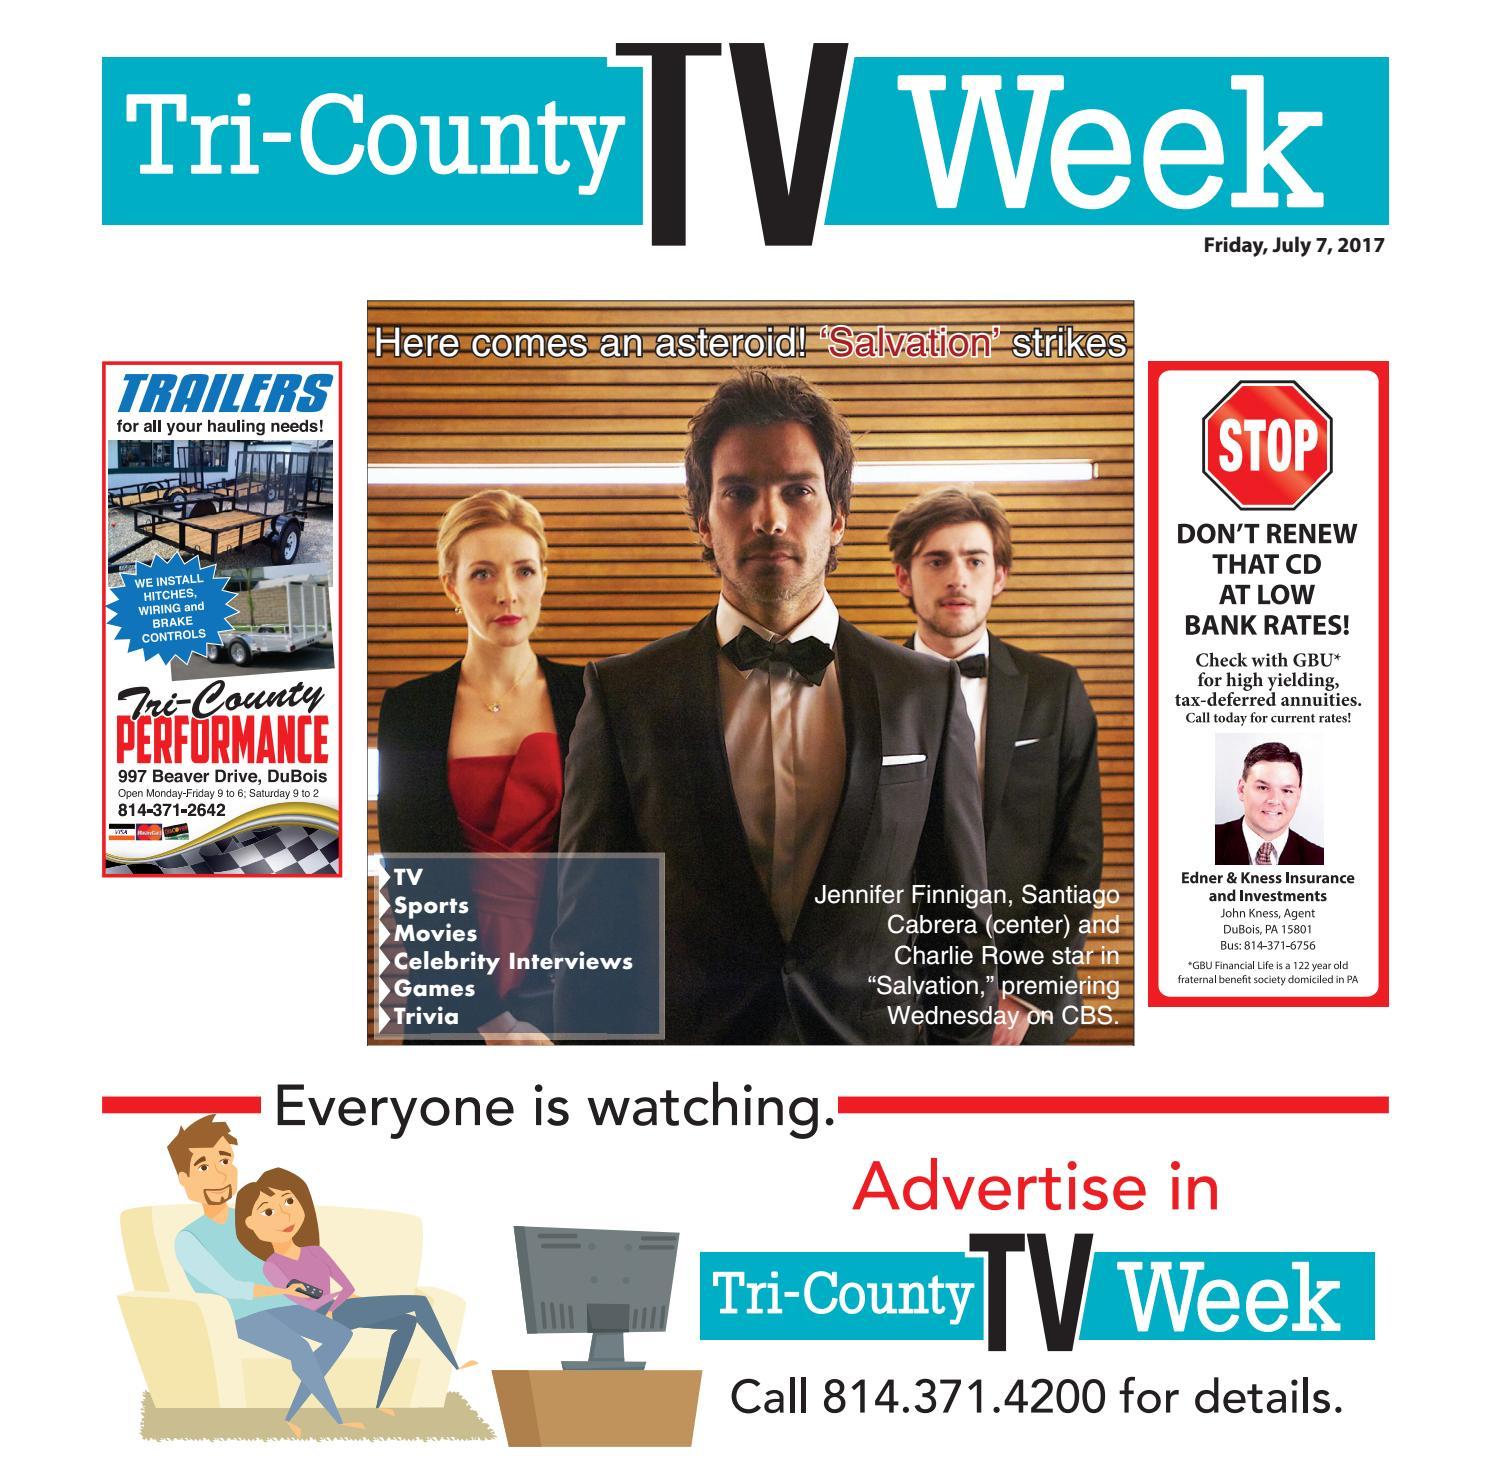 Carla Hidalgo Foto Porno tv week 07/07/2017tri-county tv week - issuu